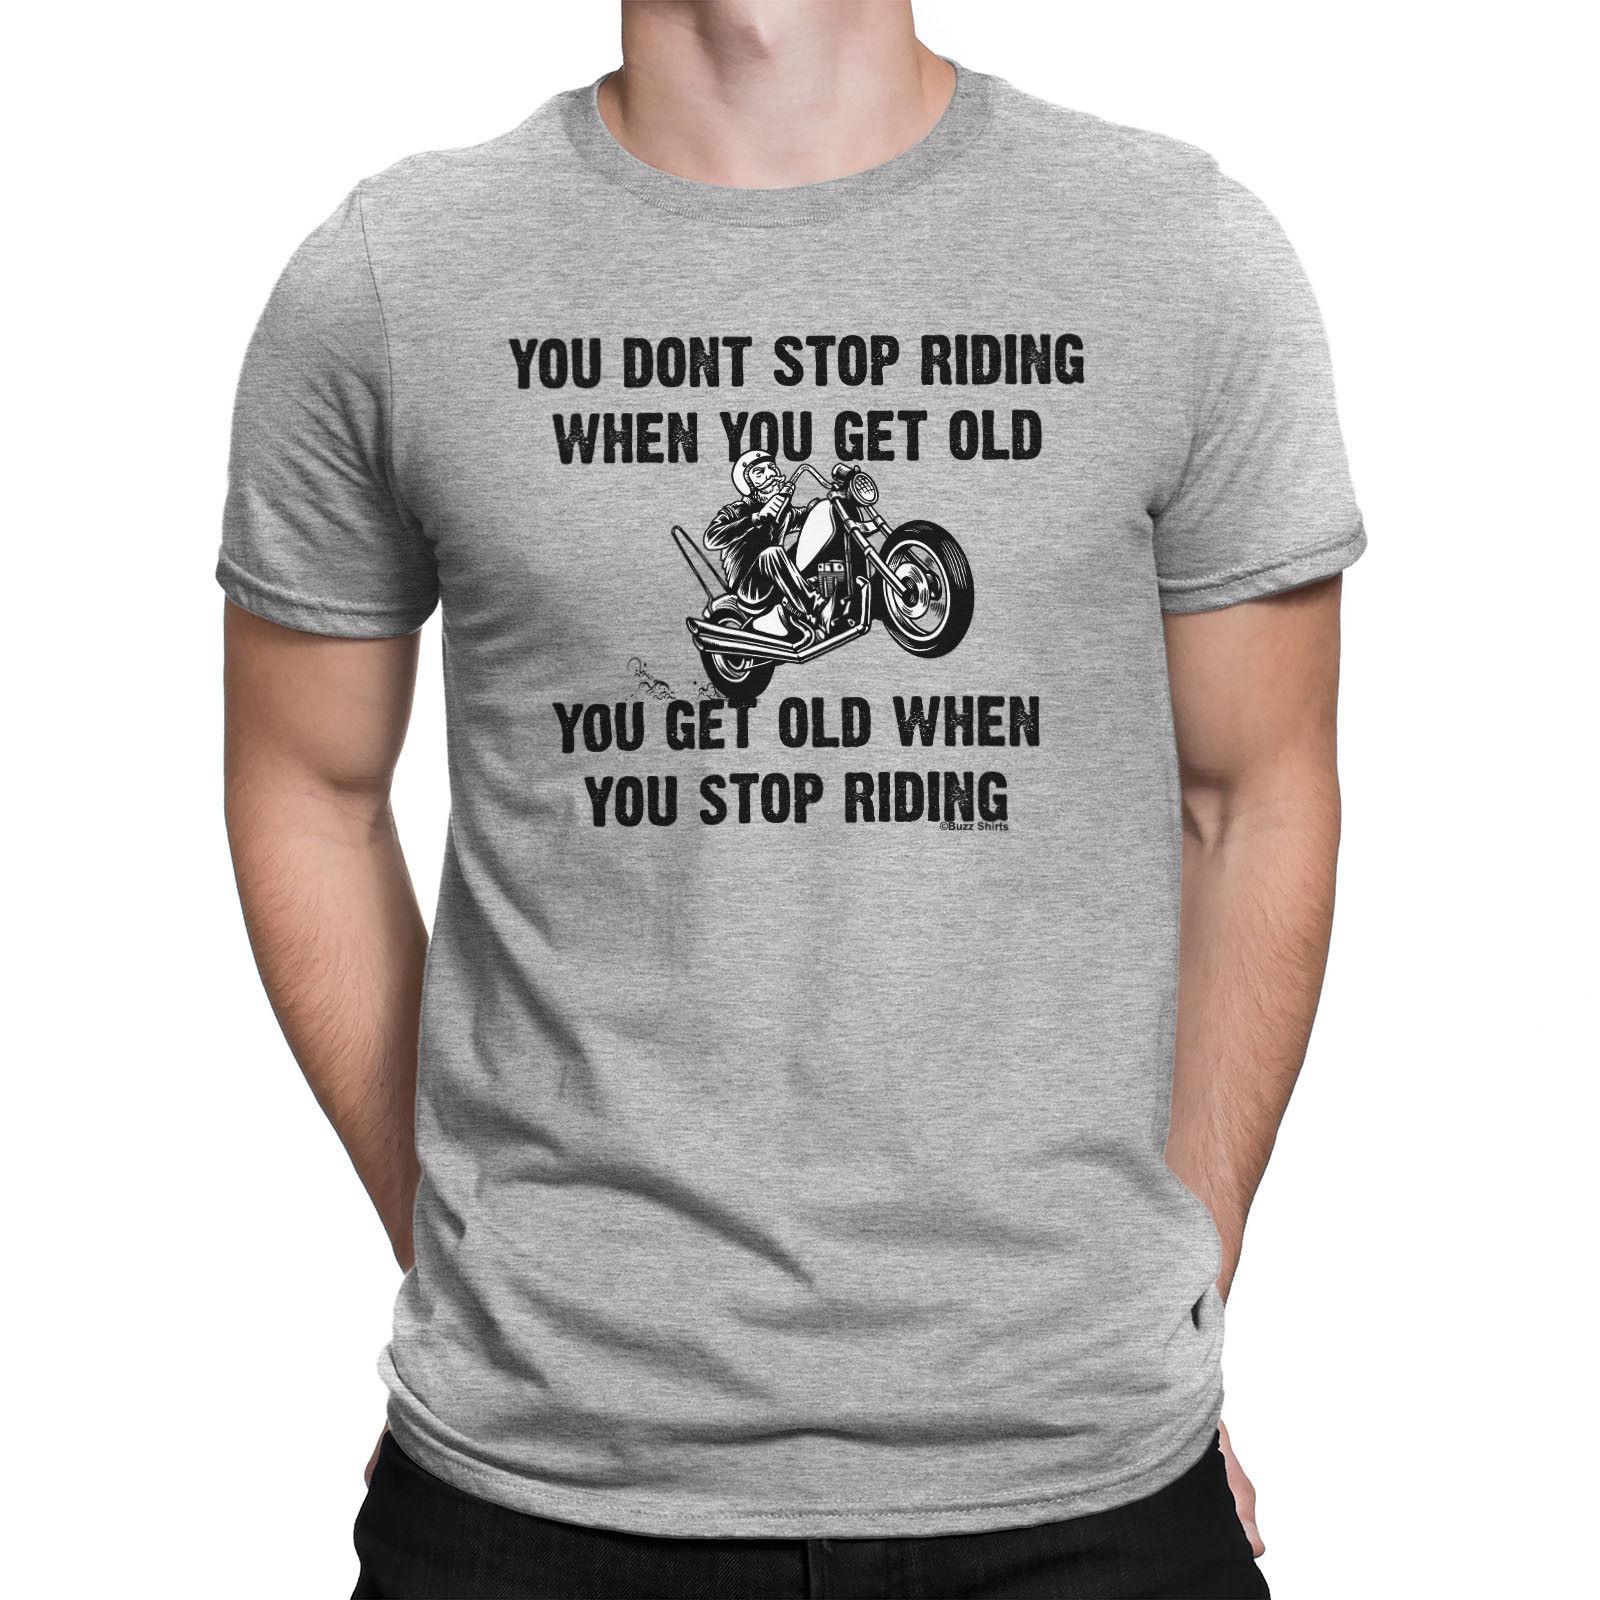 655ef5ec2a2037 Details Zu Mens Funny Biker T Shirt Motorbike Racing Bike Don Graphic T  Shirts Custom Shirt From Lukehappy14